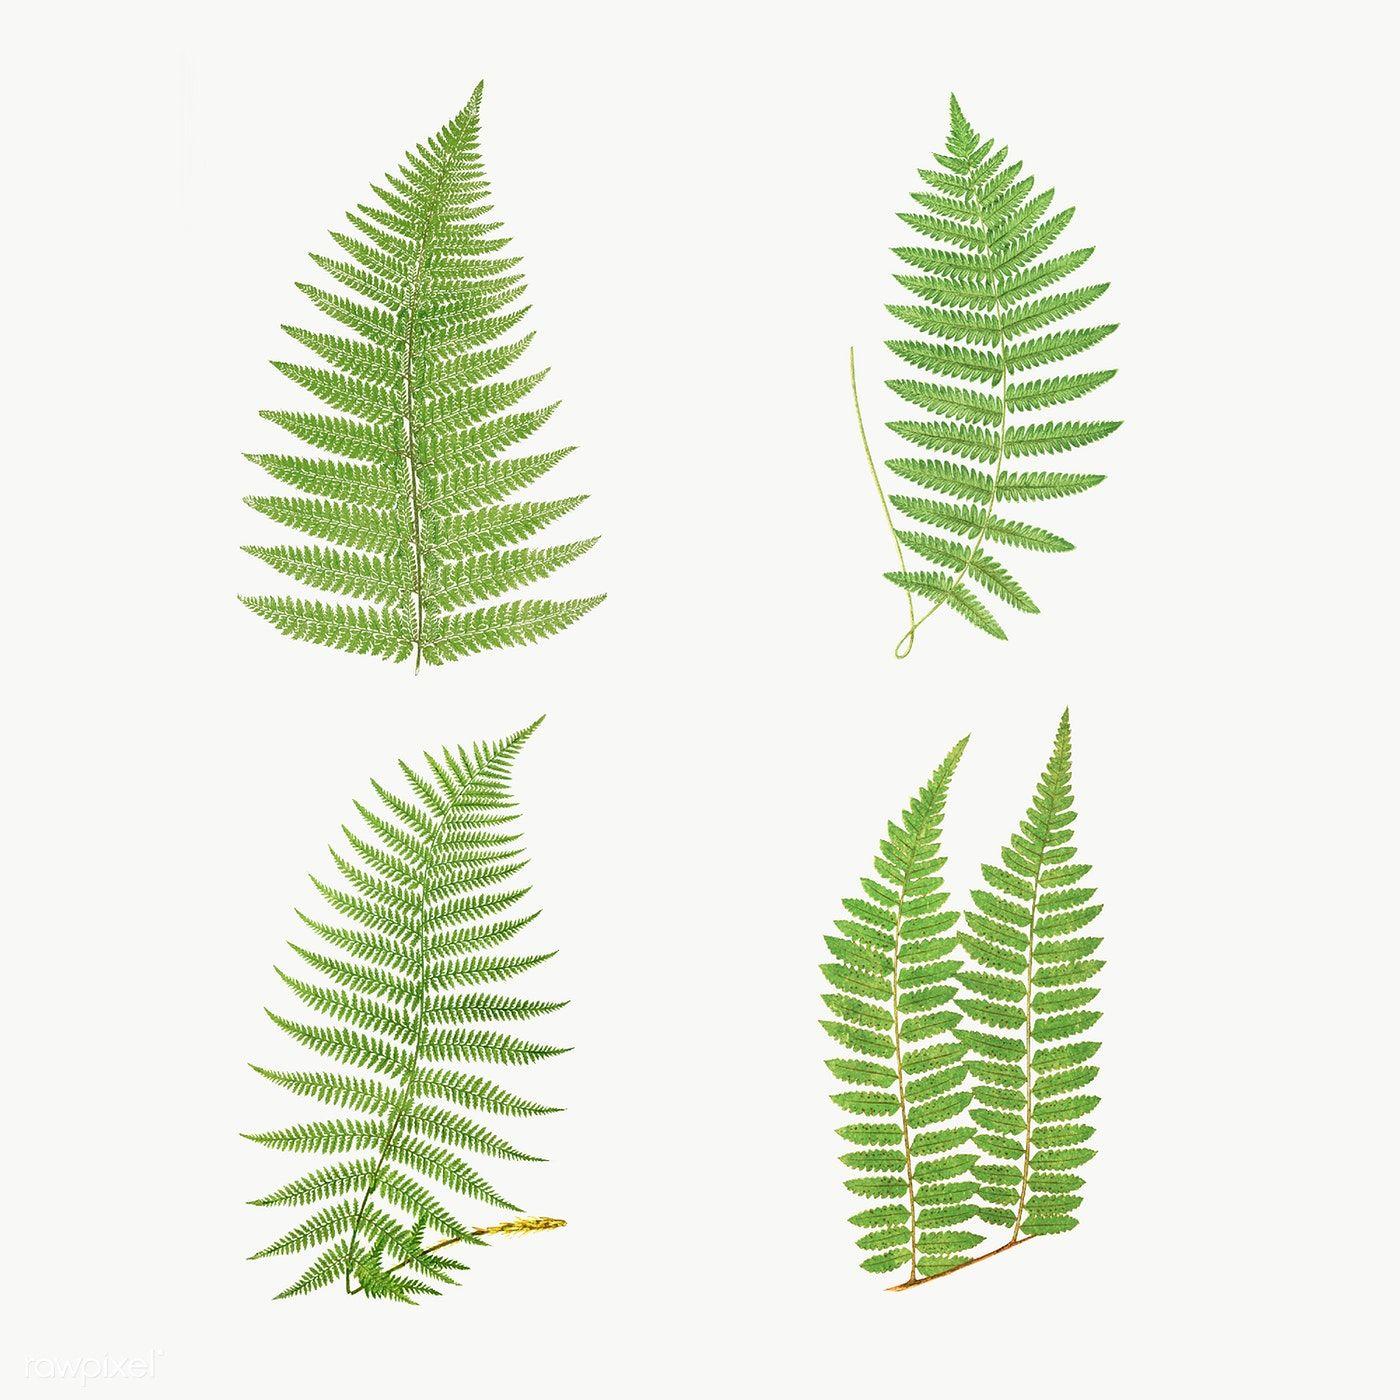 Set Of Fern Leaves Transparent Png Premium Image By Rawpixel Com Nam